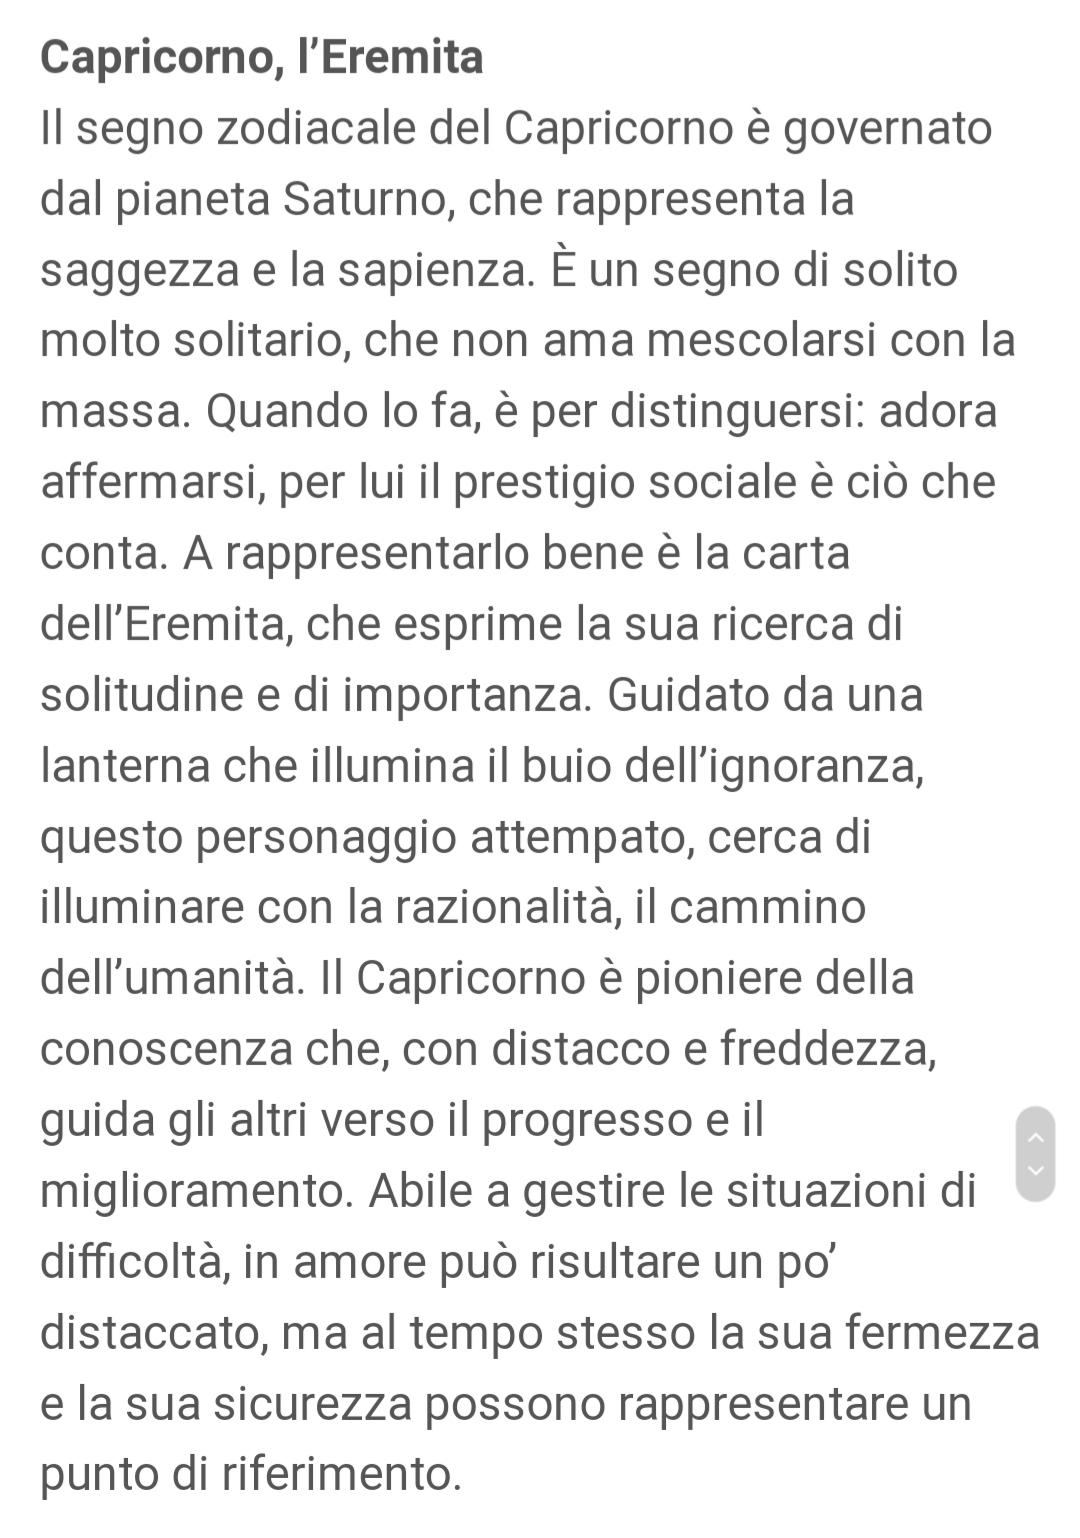 https://www.magiadosole.com/wp-content/uploads/2019/06/CAPRICORNO.jpg